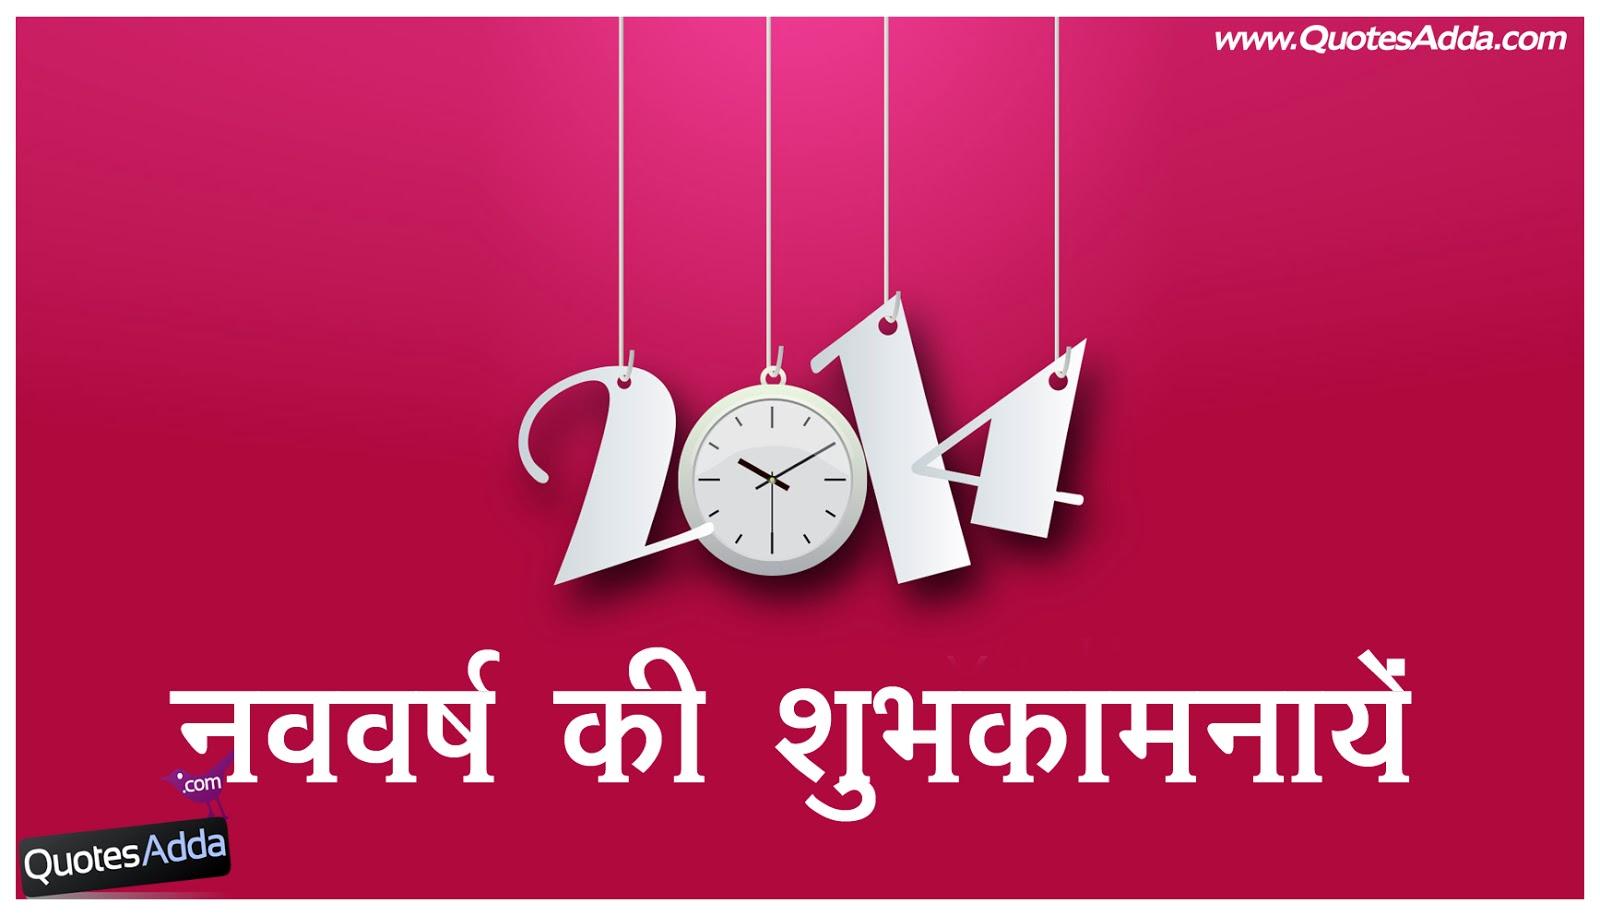 Quotes Hindi Happy New Year